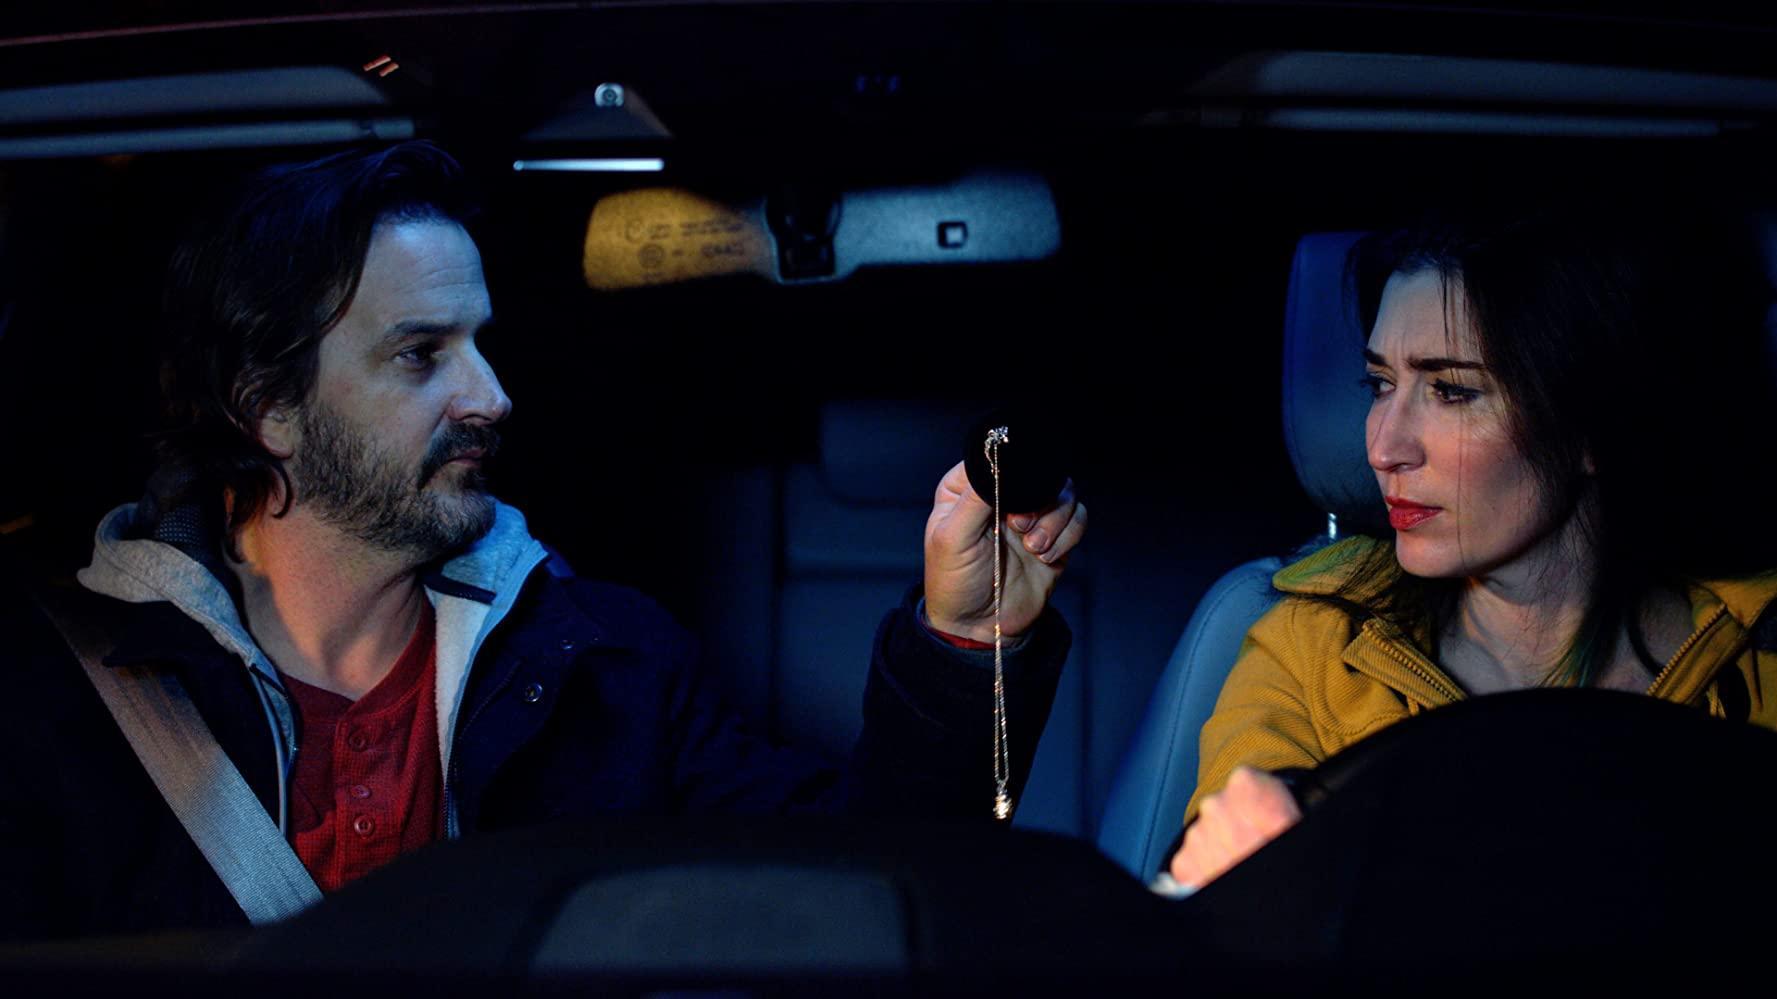 مشاهدة فيلم Driven (2019) مترجم HD اون لاين